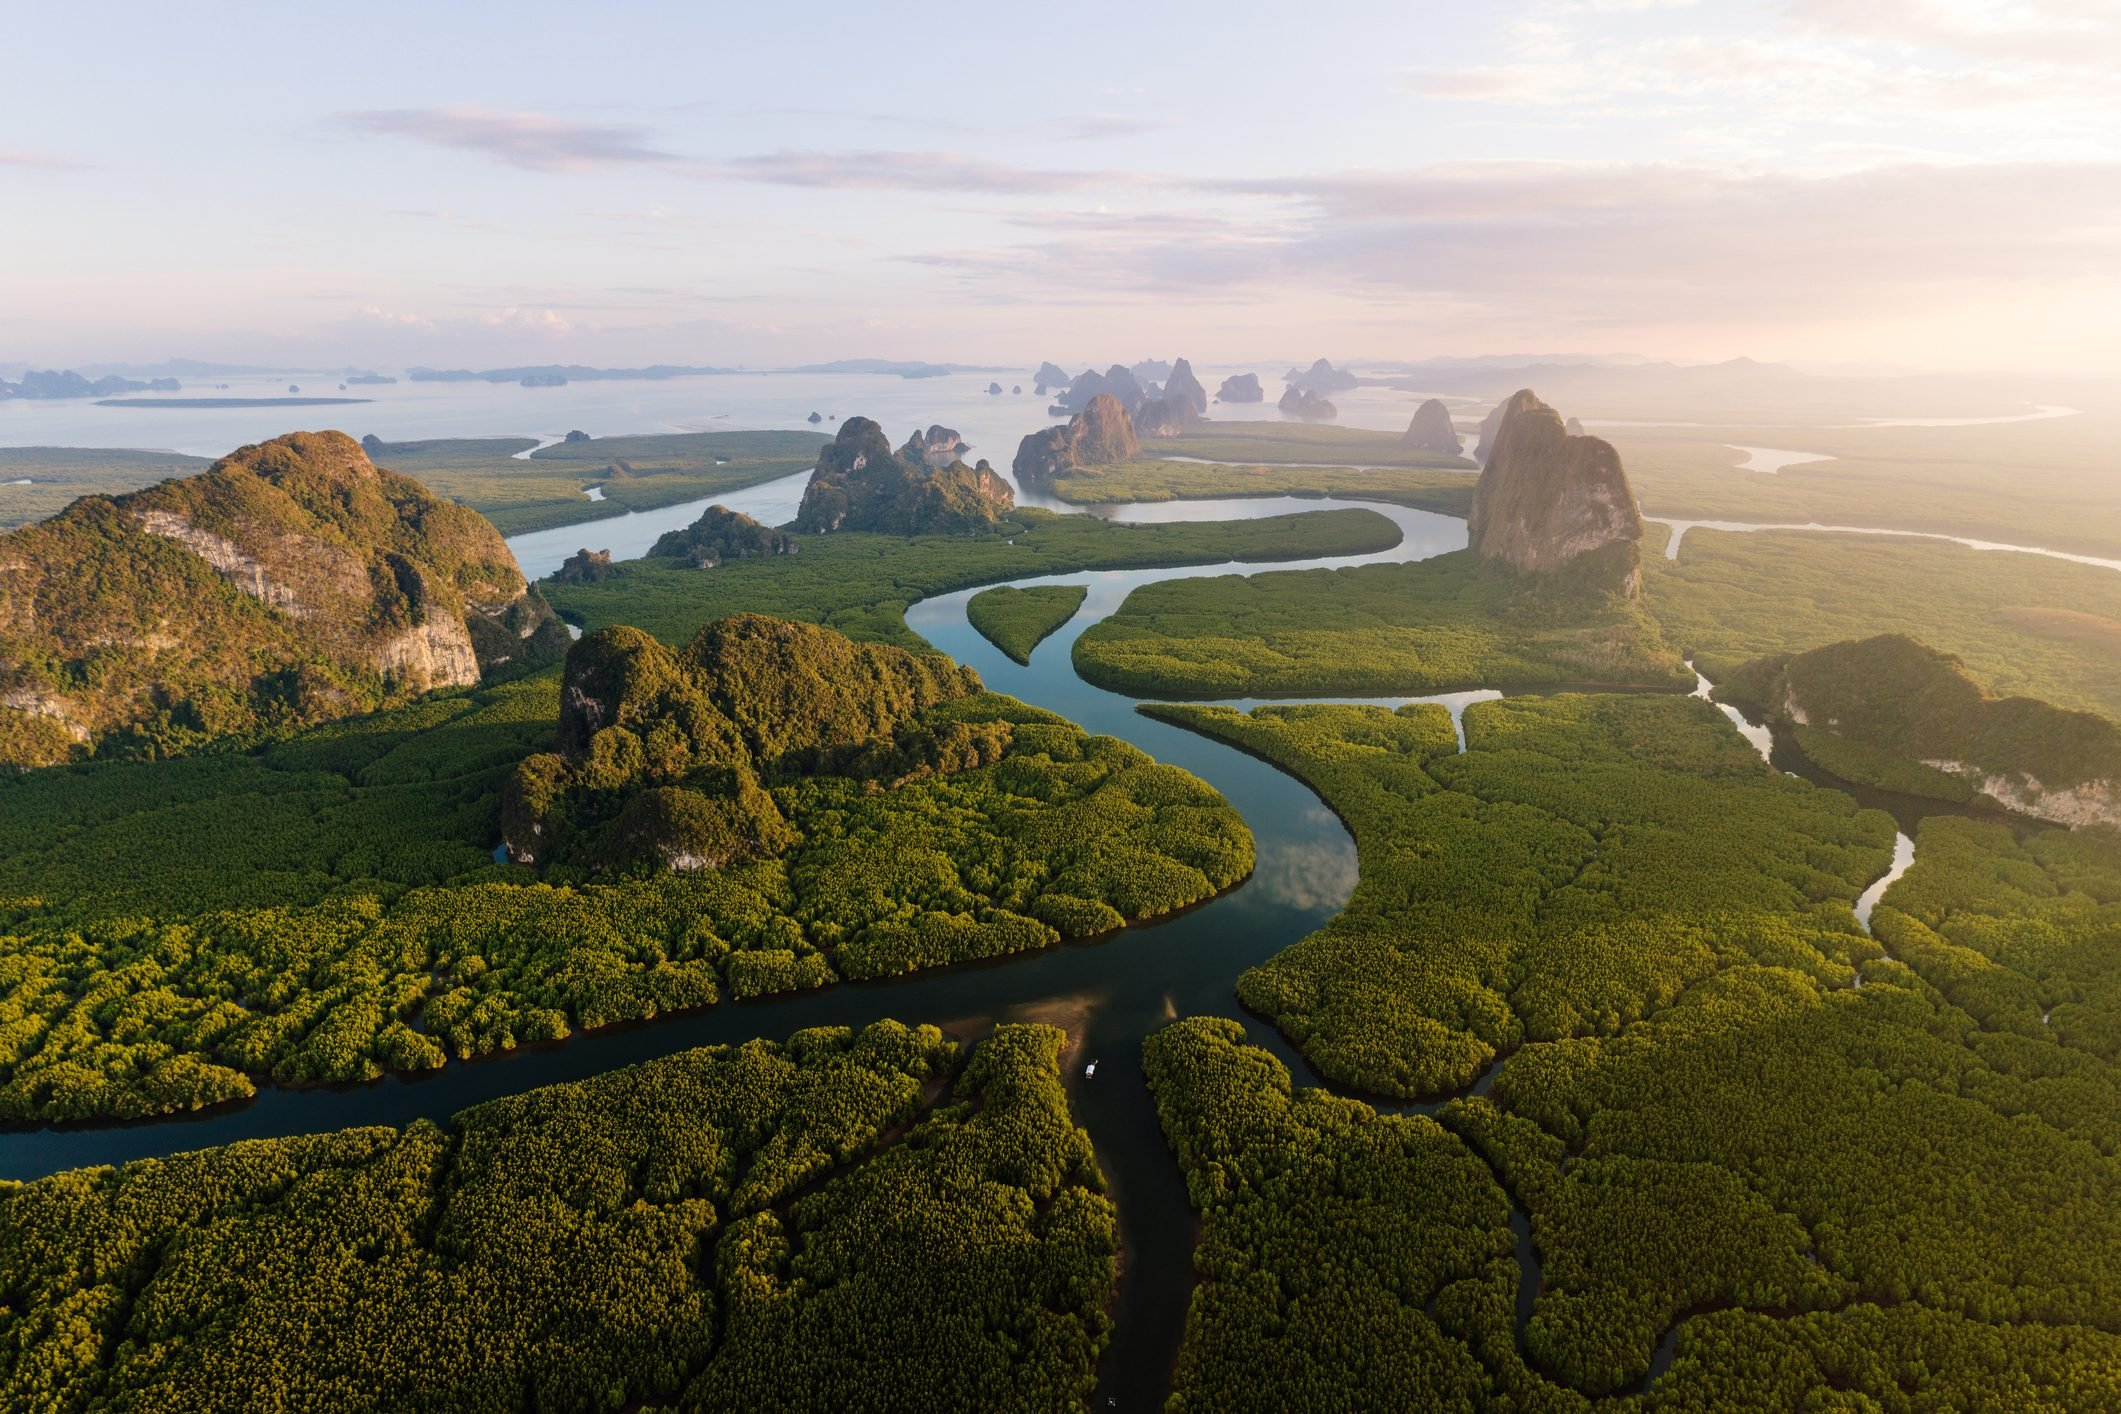 Aerial view of river and karst peaks, Phang Nga bay, Thailand